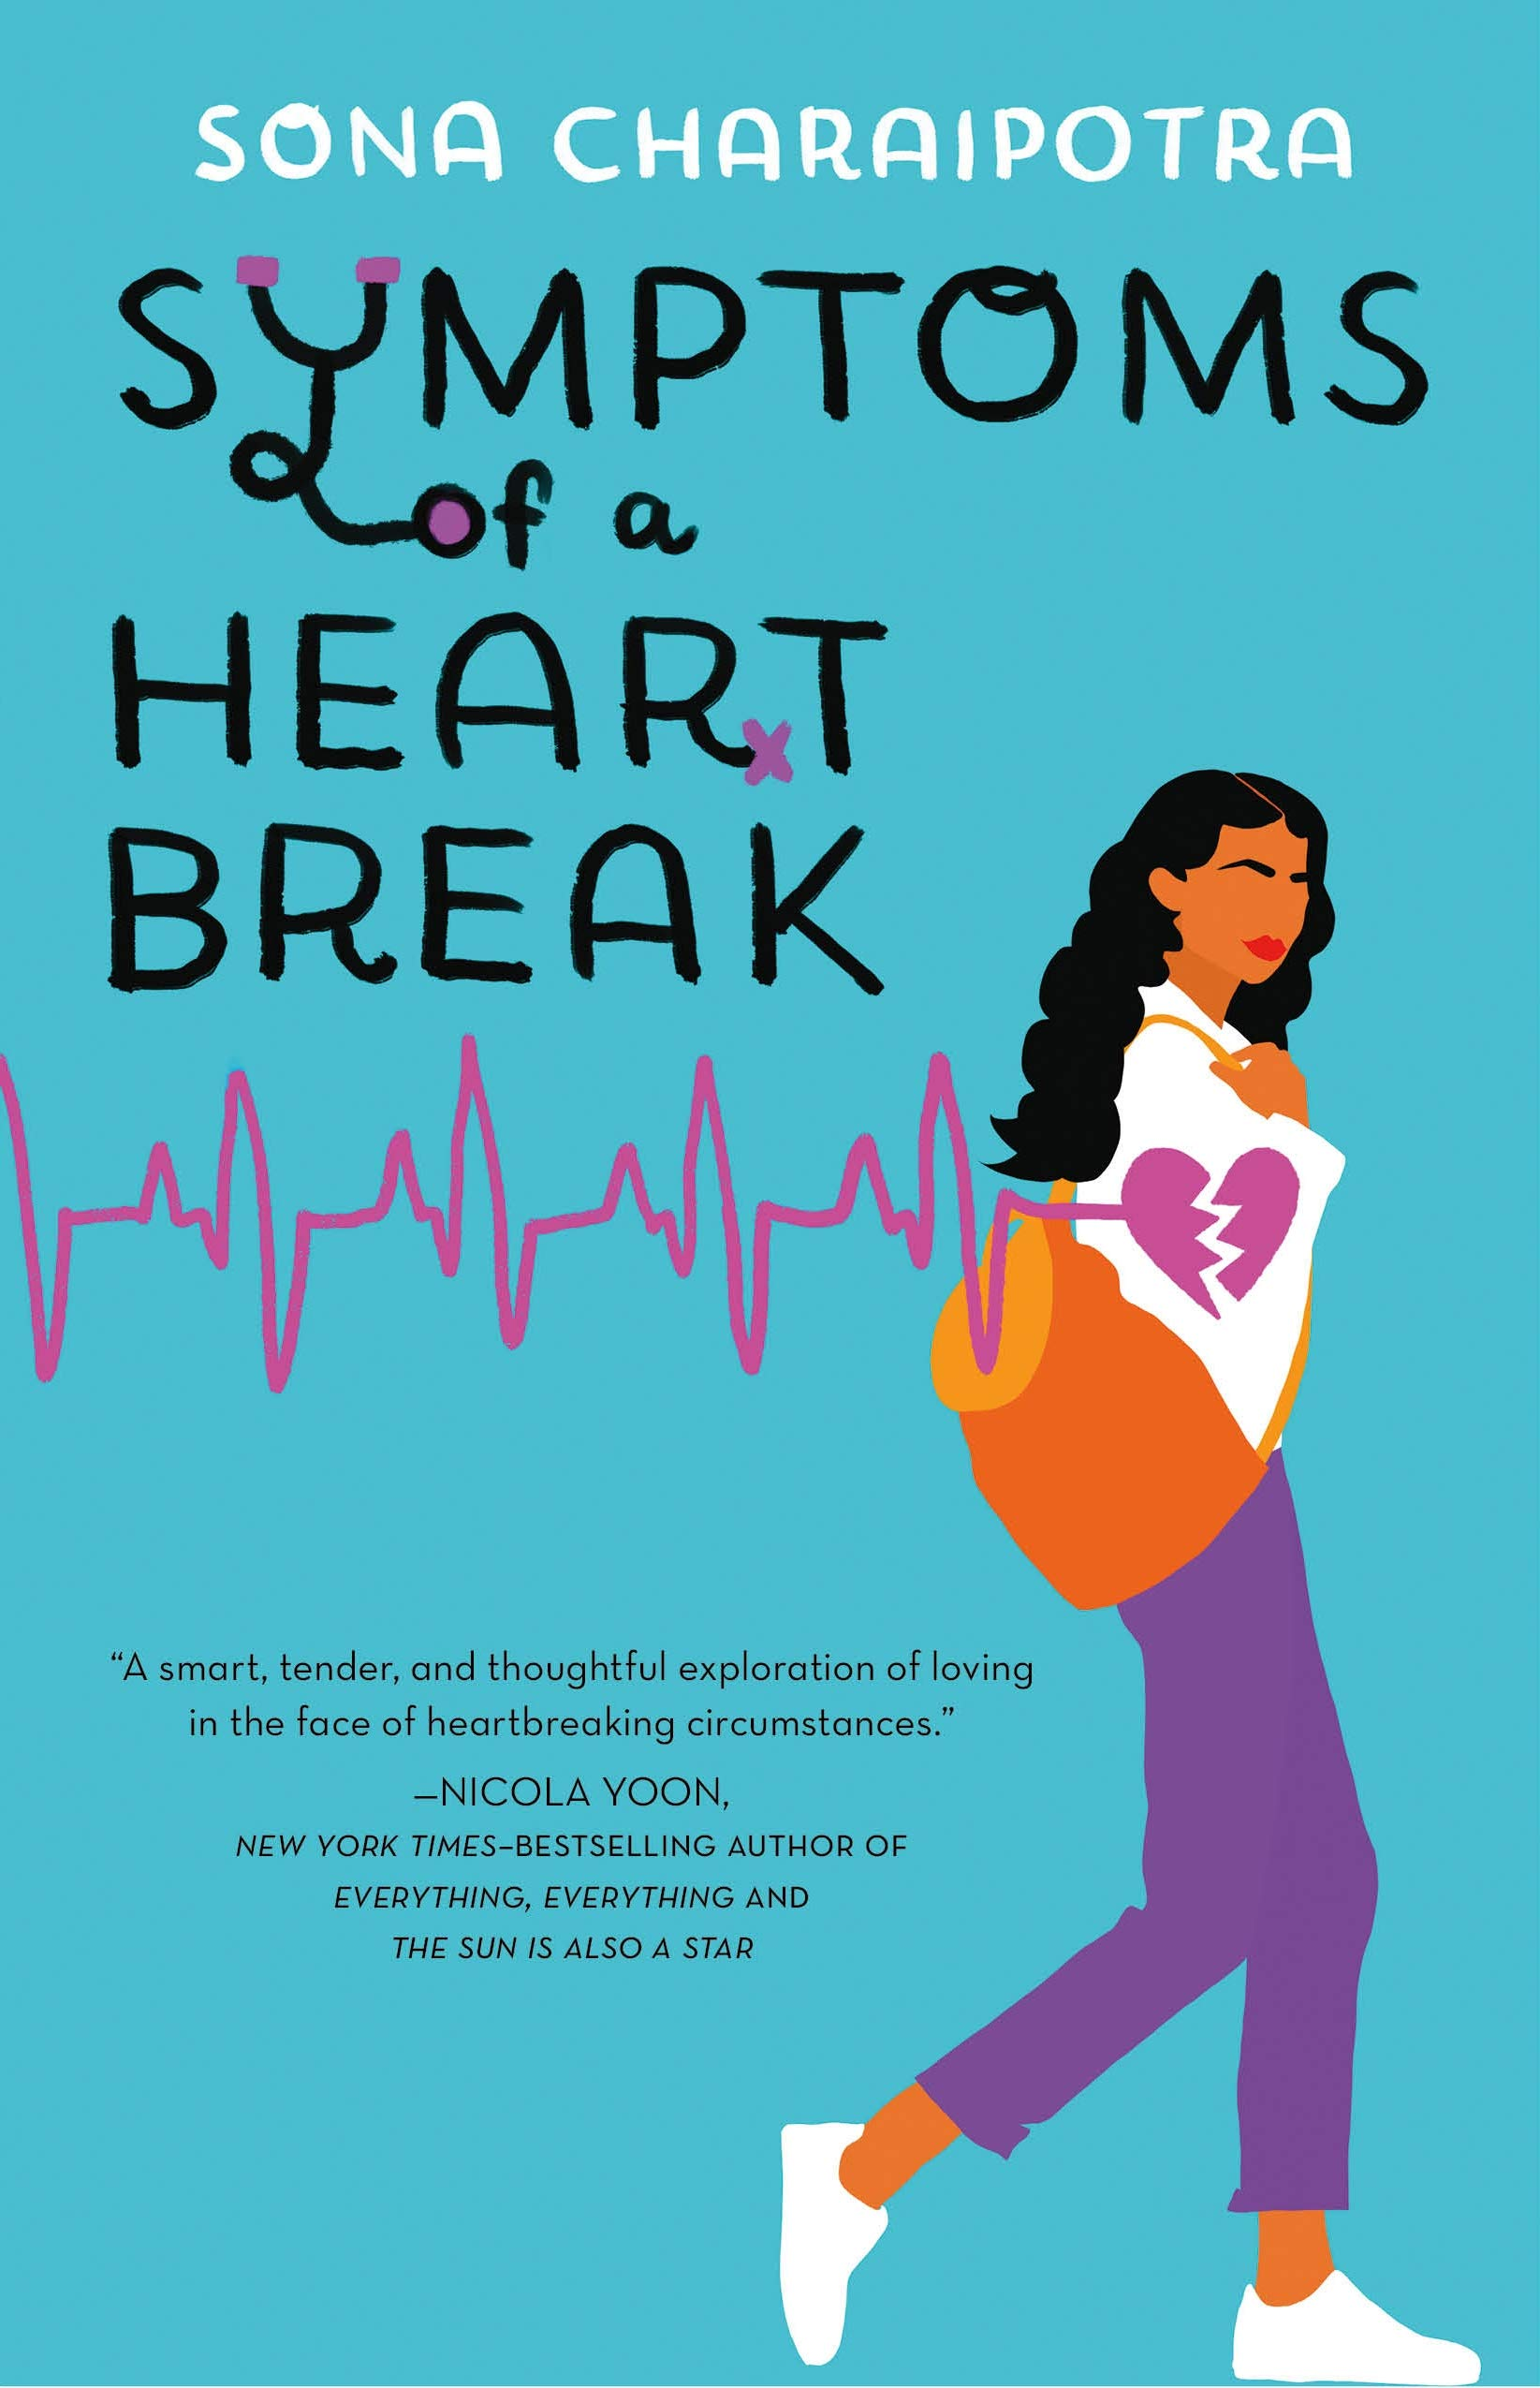 Symptoms of a Heartbreak by Sona Charaipotra